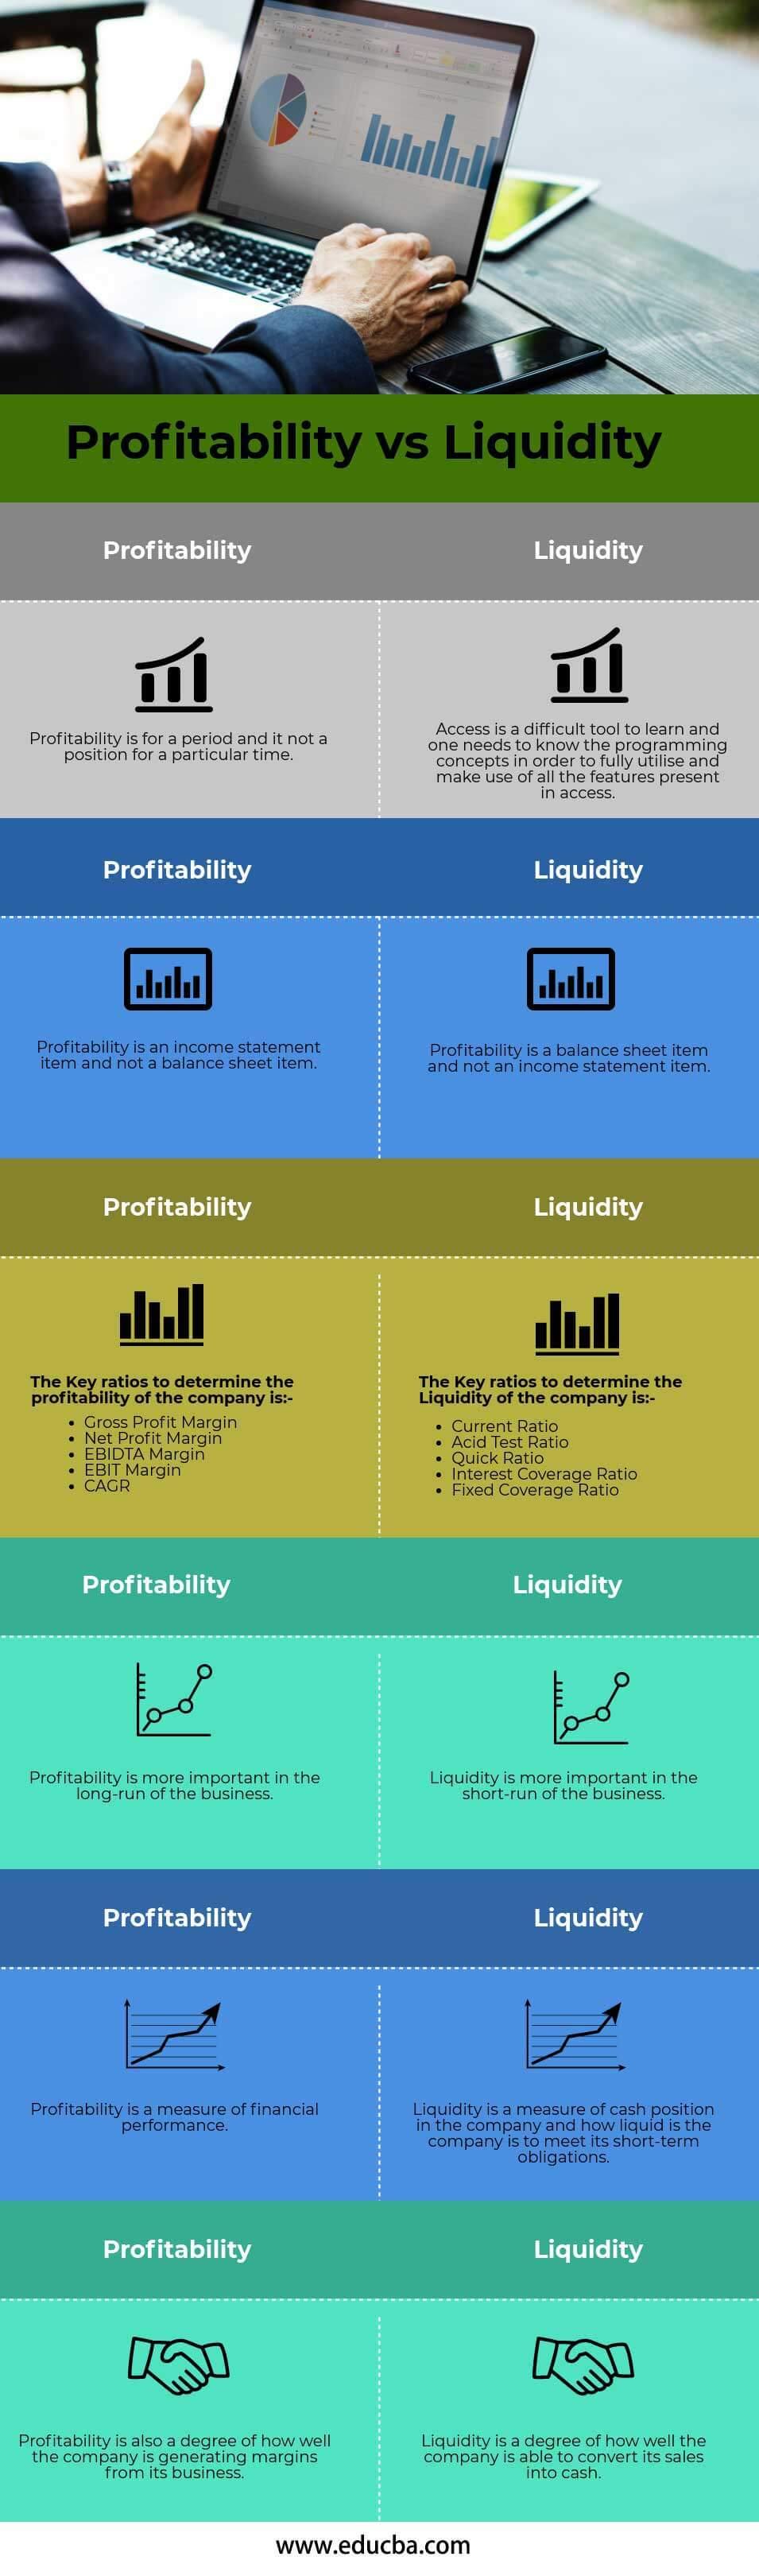 Profitability vs Liquidity (info)